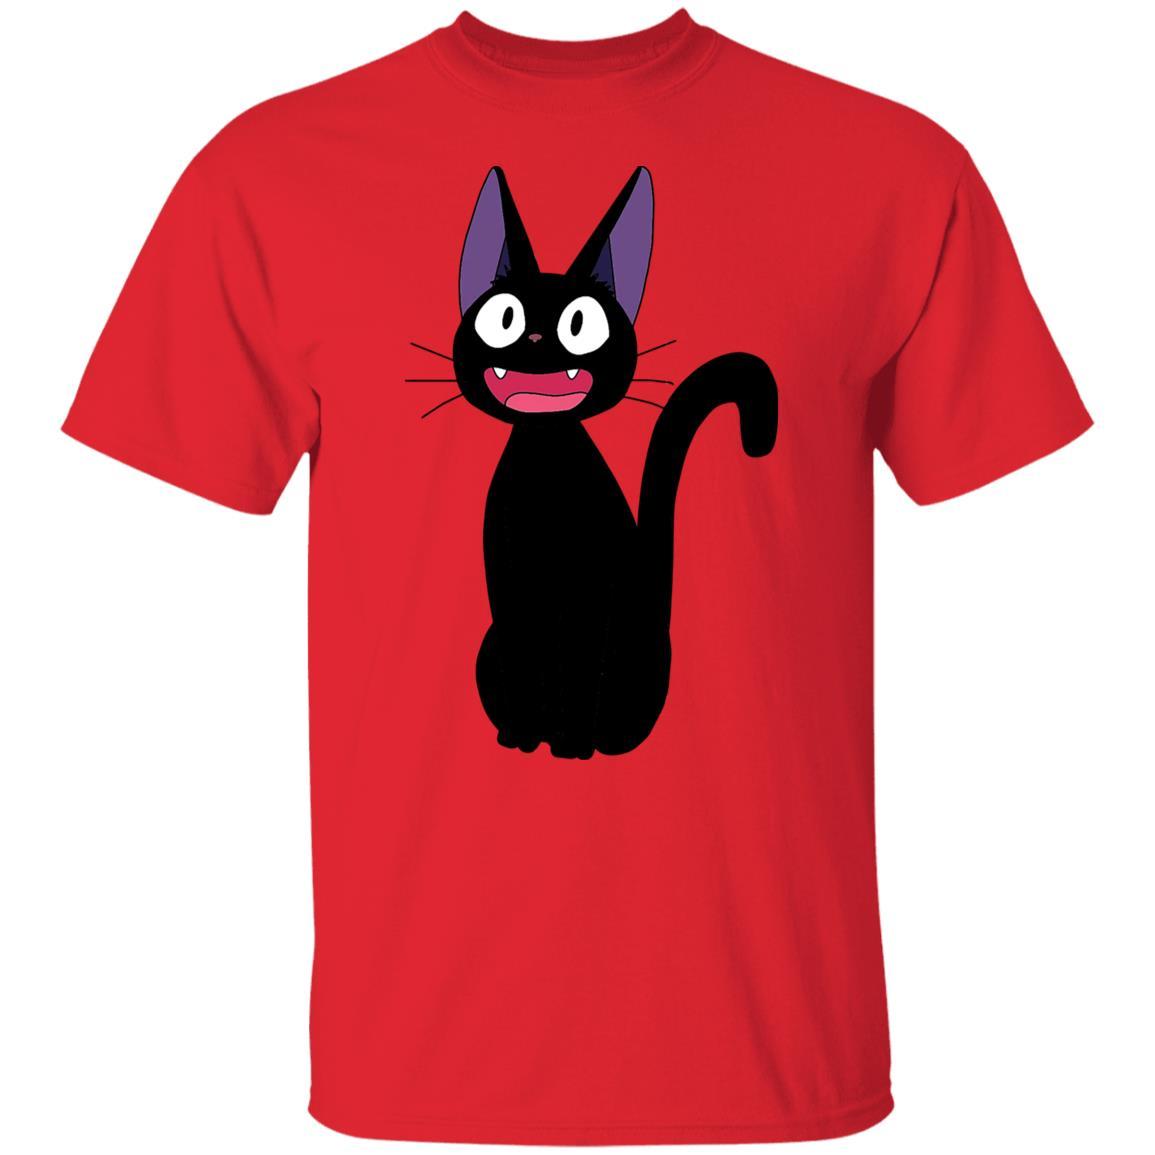 Kiki's Delivery Service  – Jiji Style 2 T Shirt